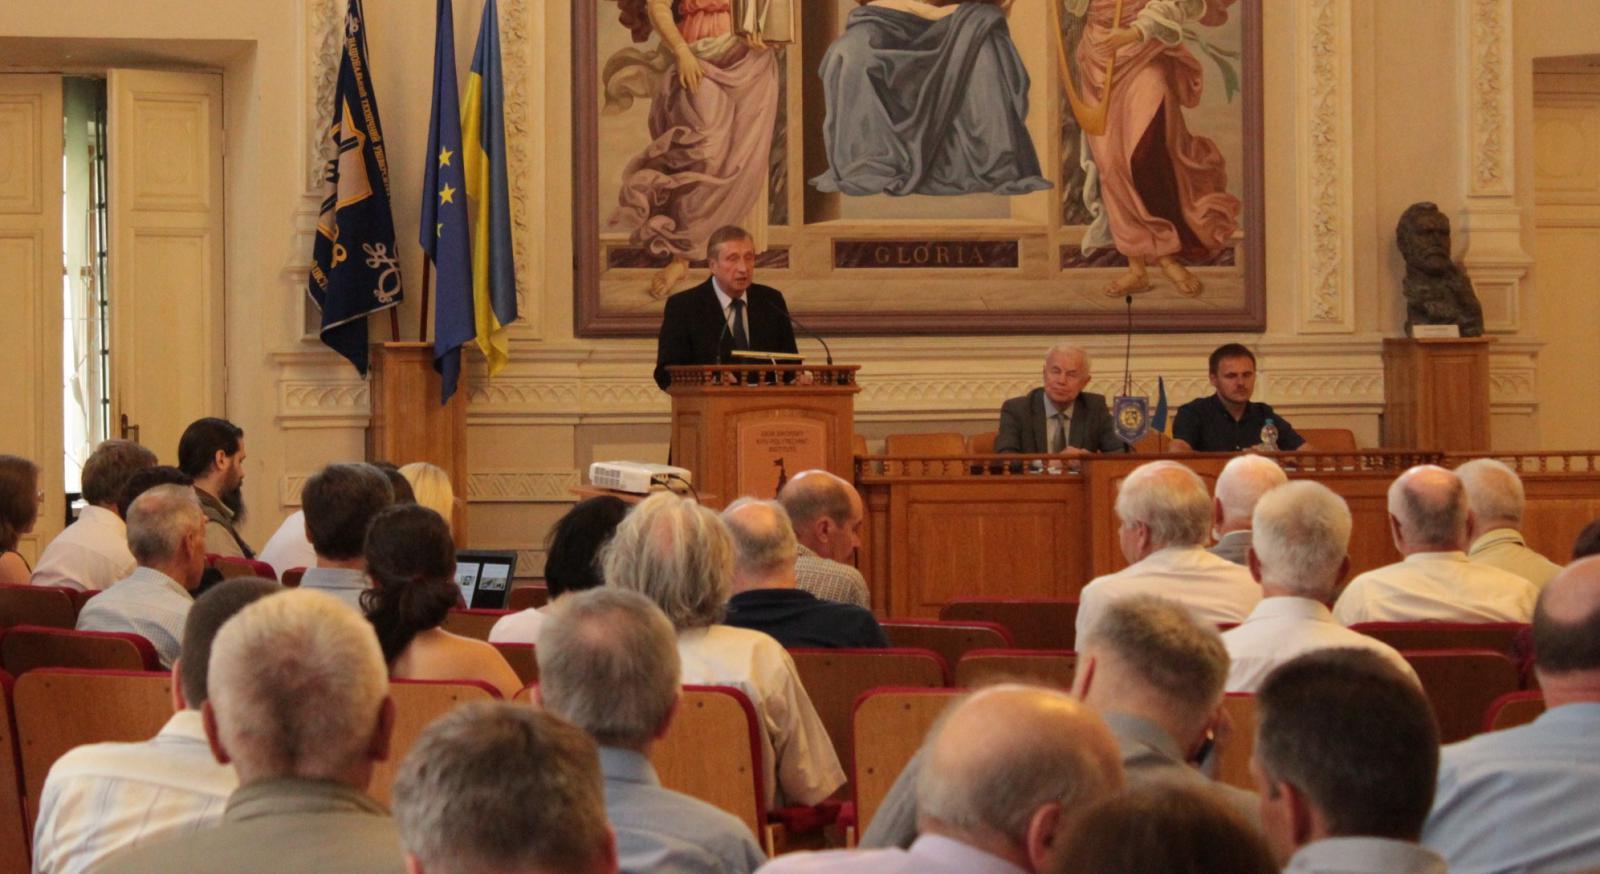 2019.05.27 Michael Zgurovsky presented his electoral program